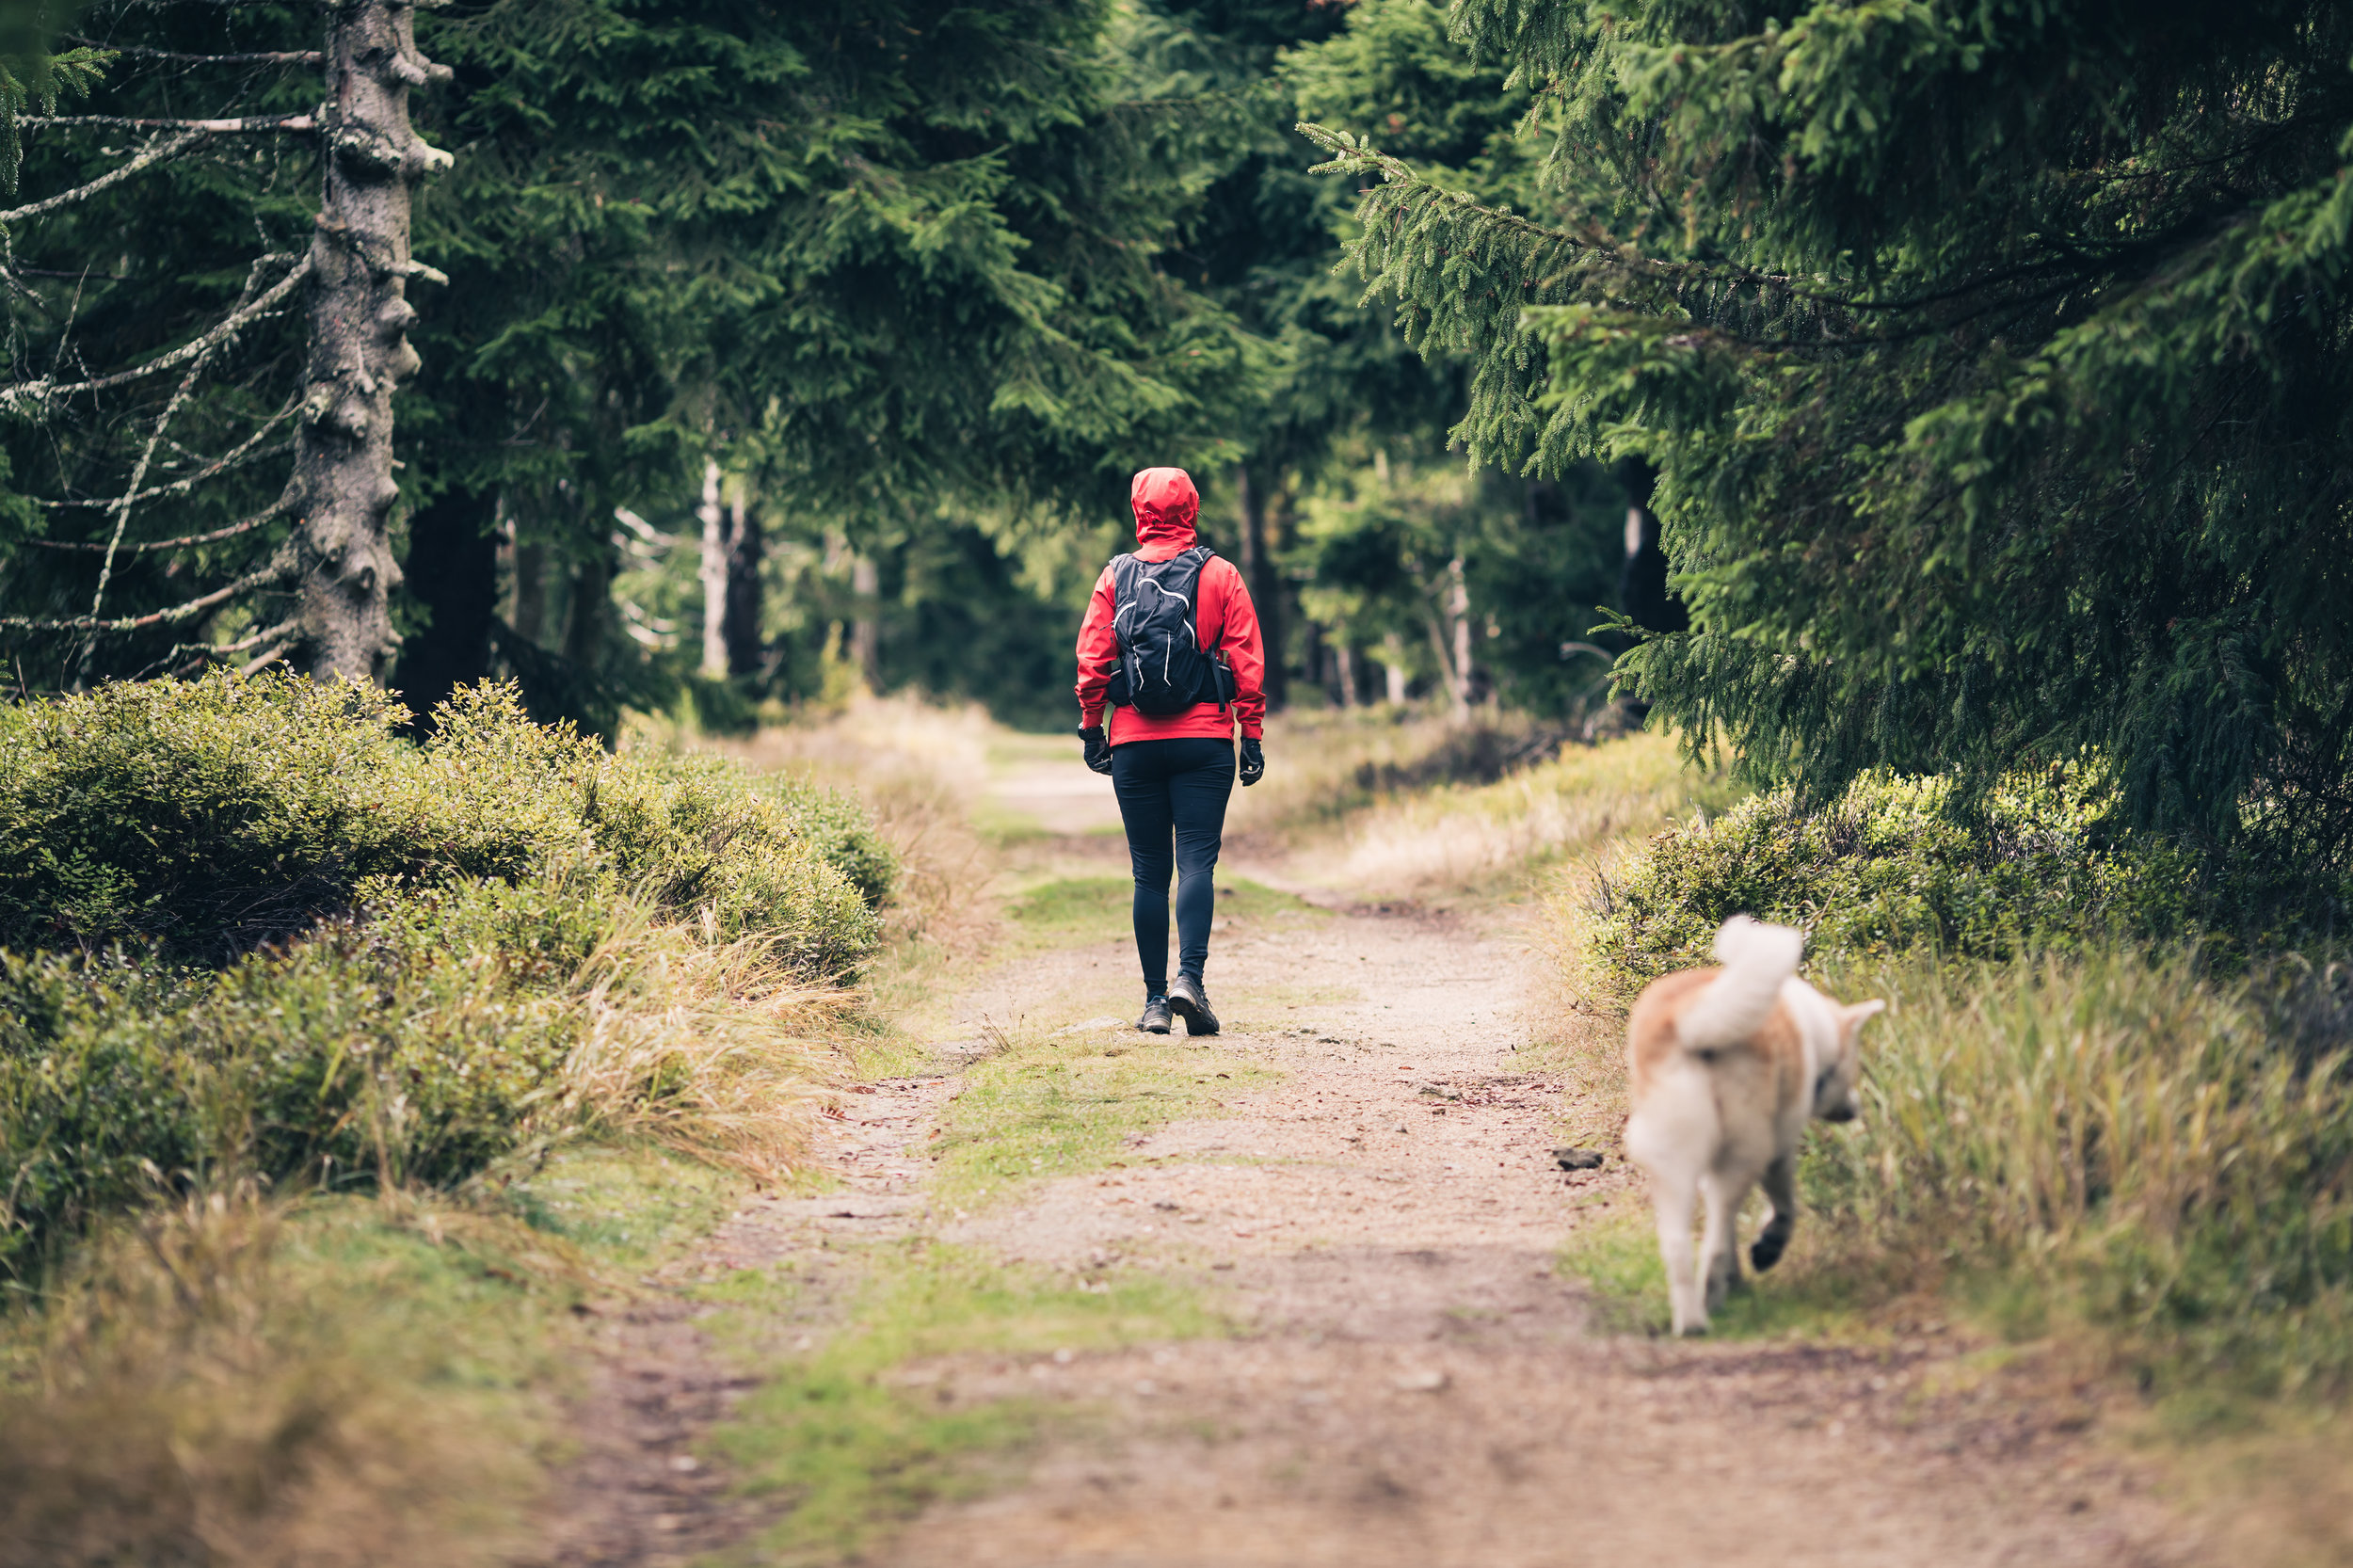 happy-woman-hiking-walking-with-dog-P5Z4X4Q.jpg